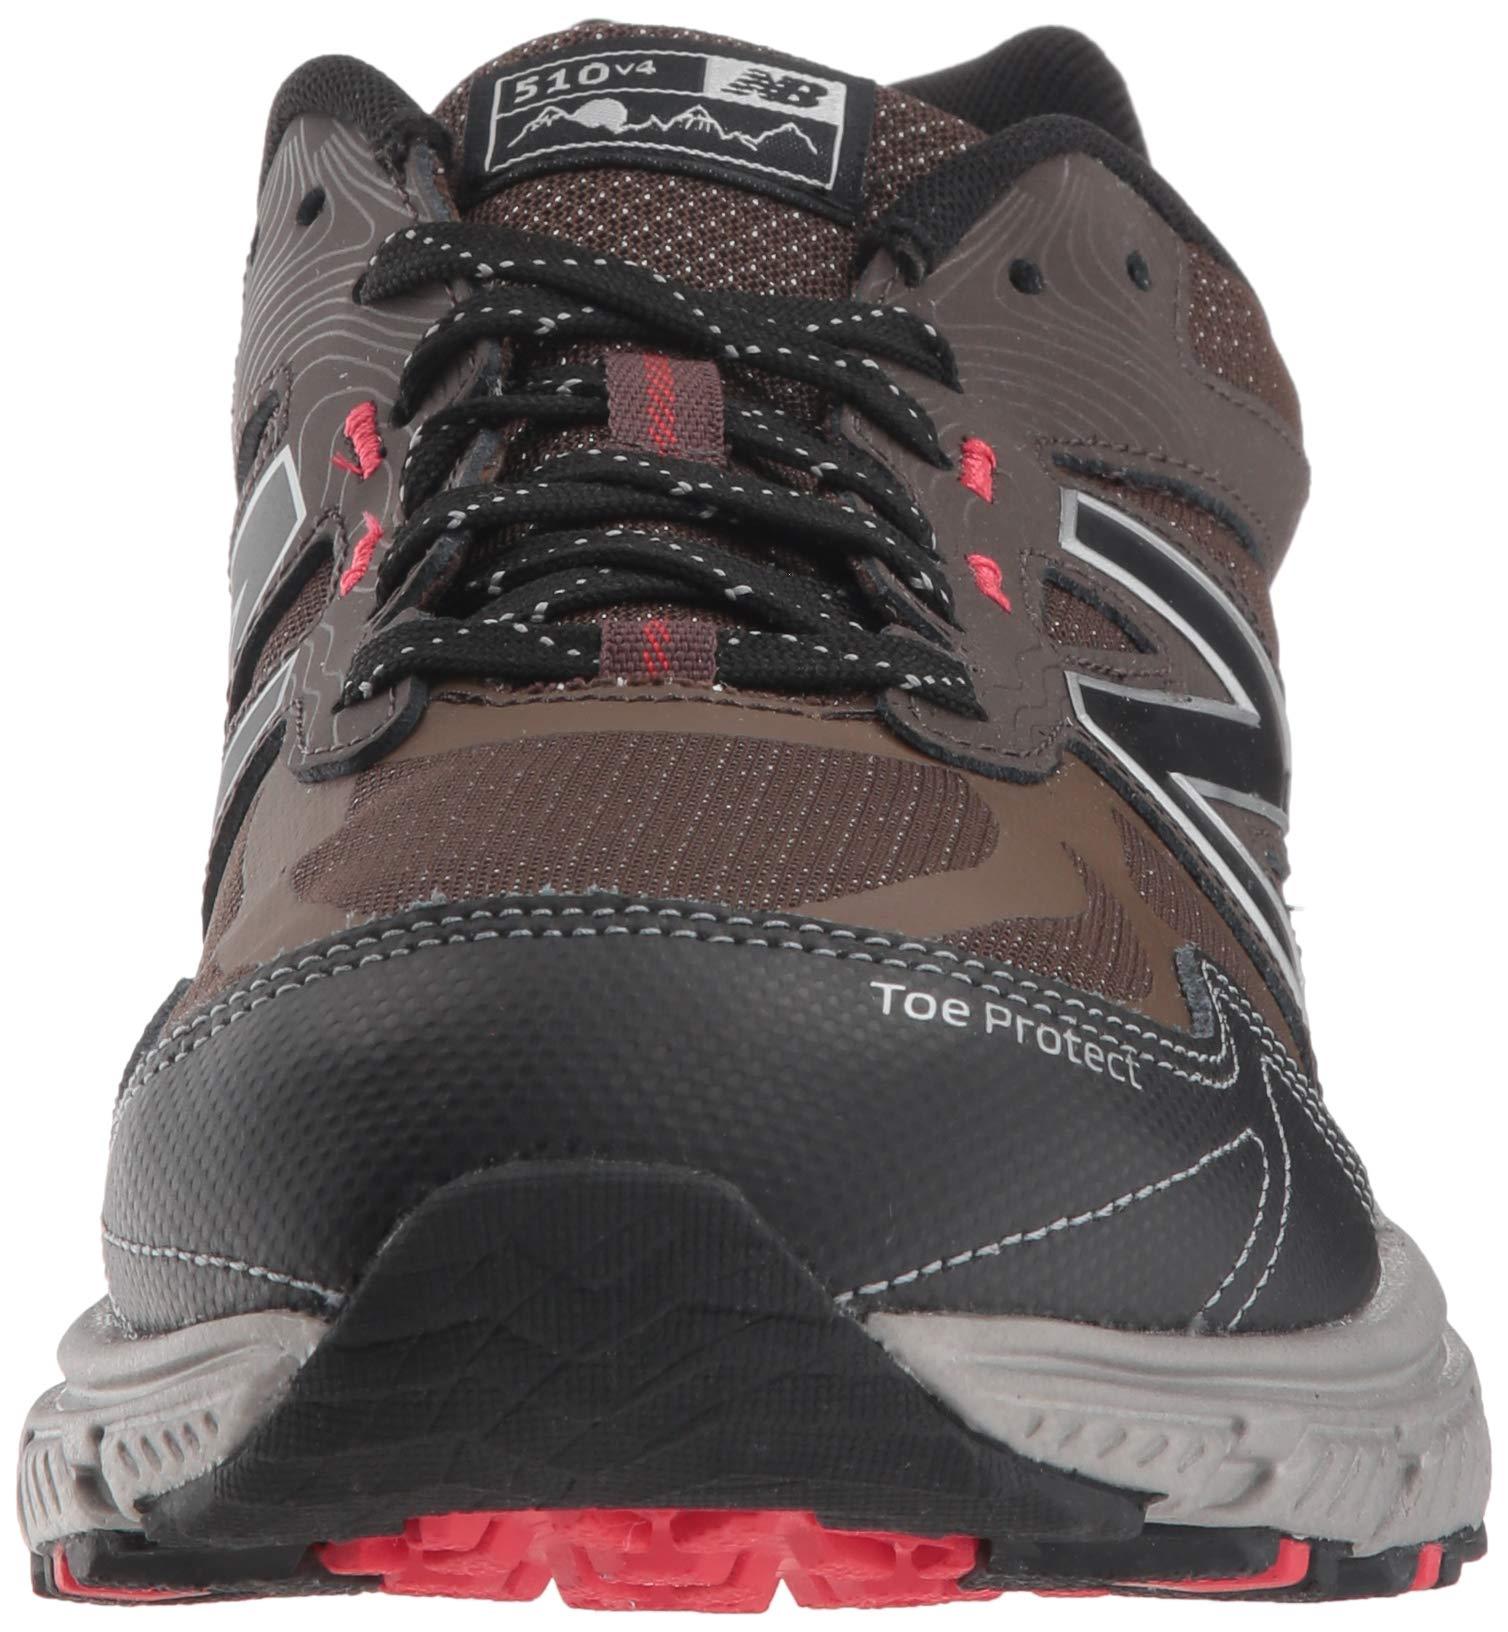 New Balance Men's 510v4 Cushioning Trail Running Shoe, Chocolate/Black/Team red, 7 D US by New Balance (Image #4)